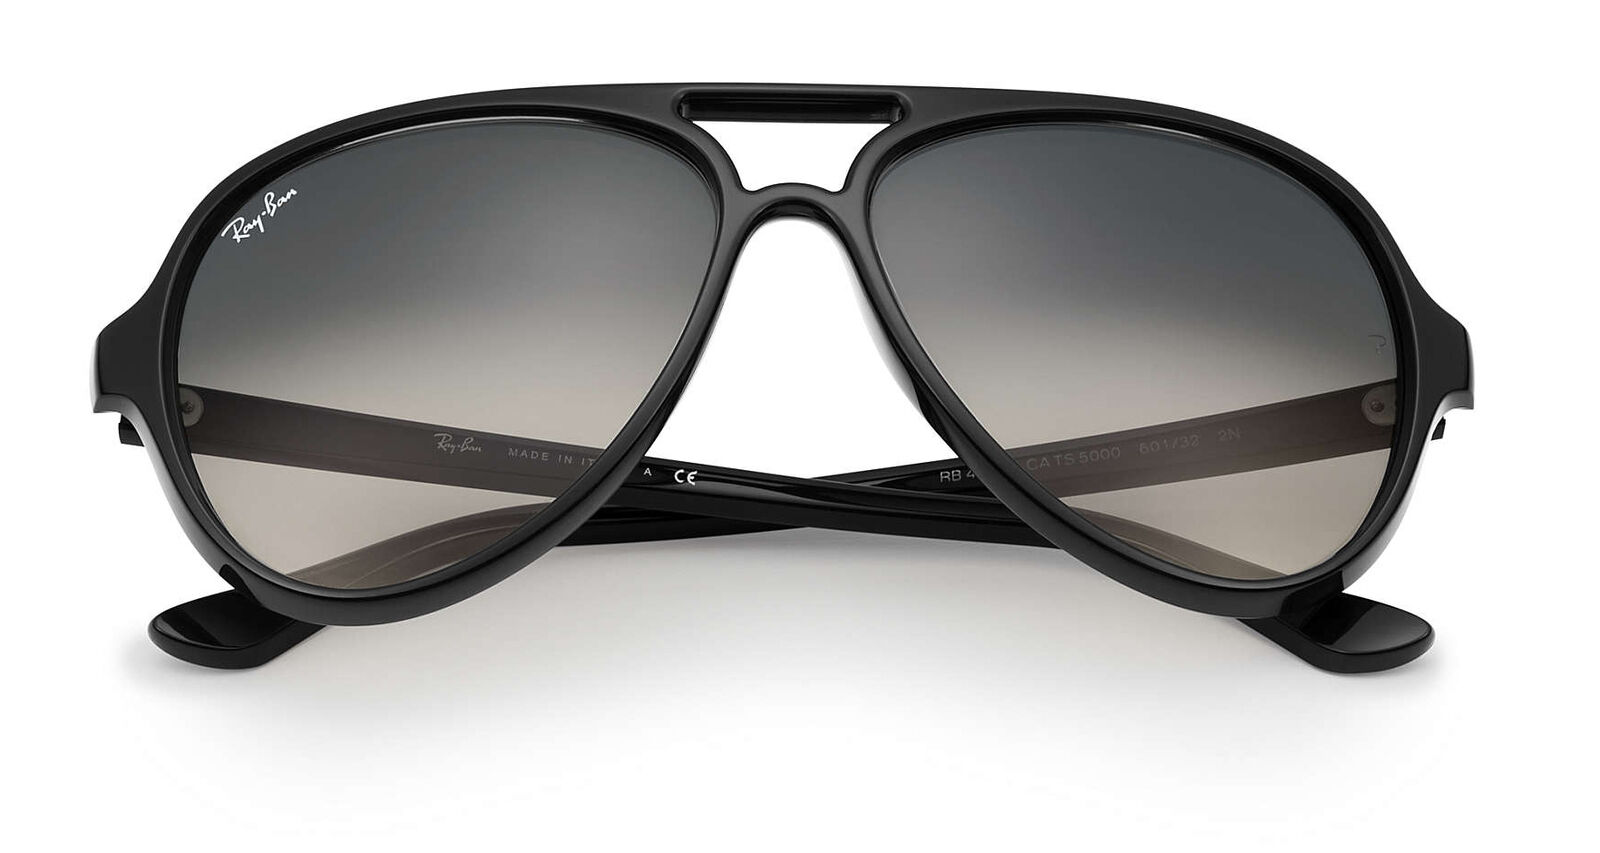 Buy Ray-Ban 59mm Cats 5000 Classic Nylon Sunglasses - Light Grey Gradient  (RB41256013259) online  f0b0f2dcdc2f